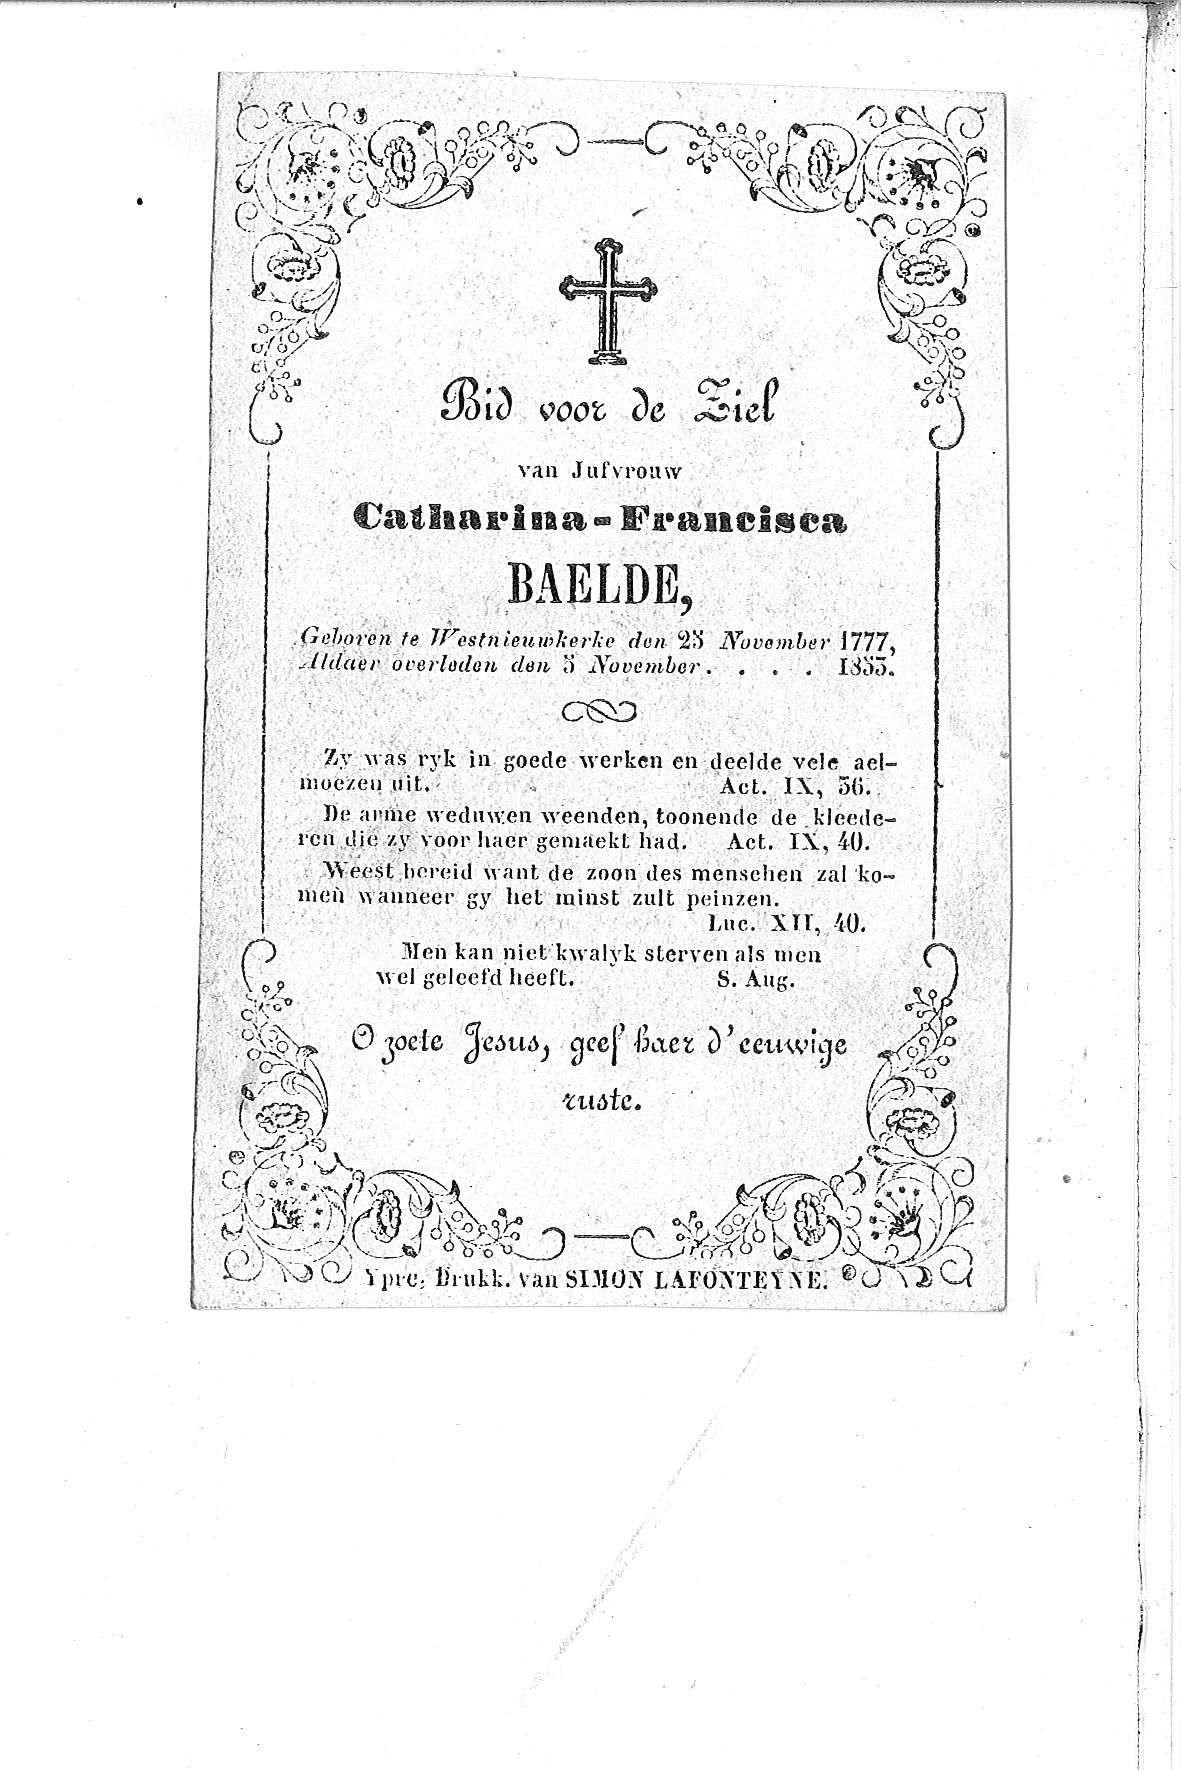 Catharina-Francisca(1853)20100928110430_00013.jpg